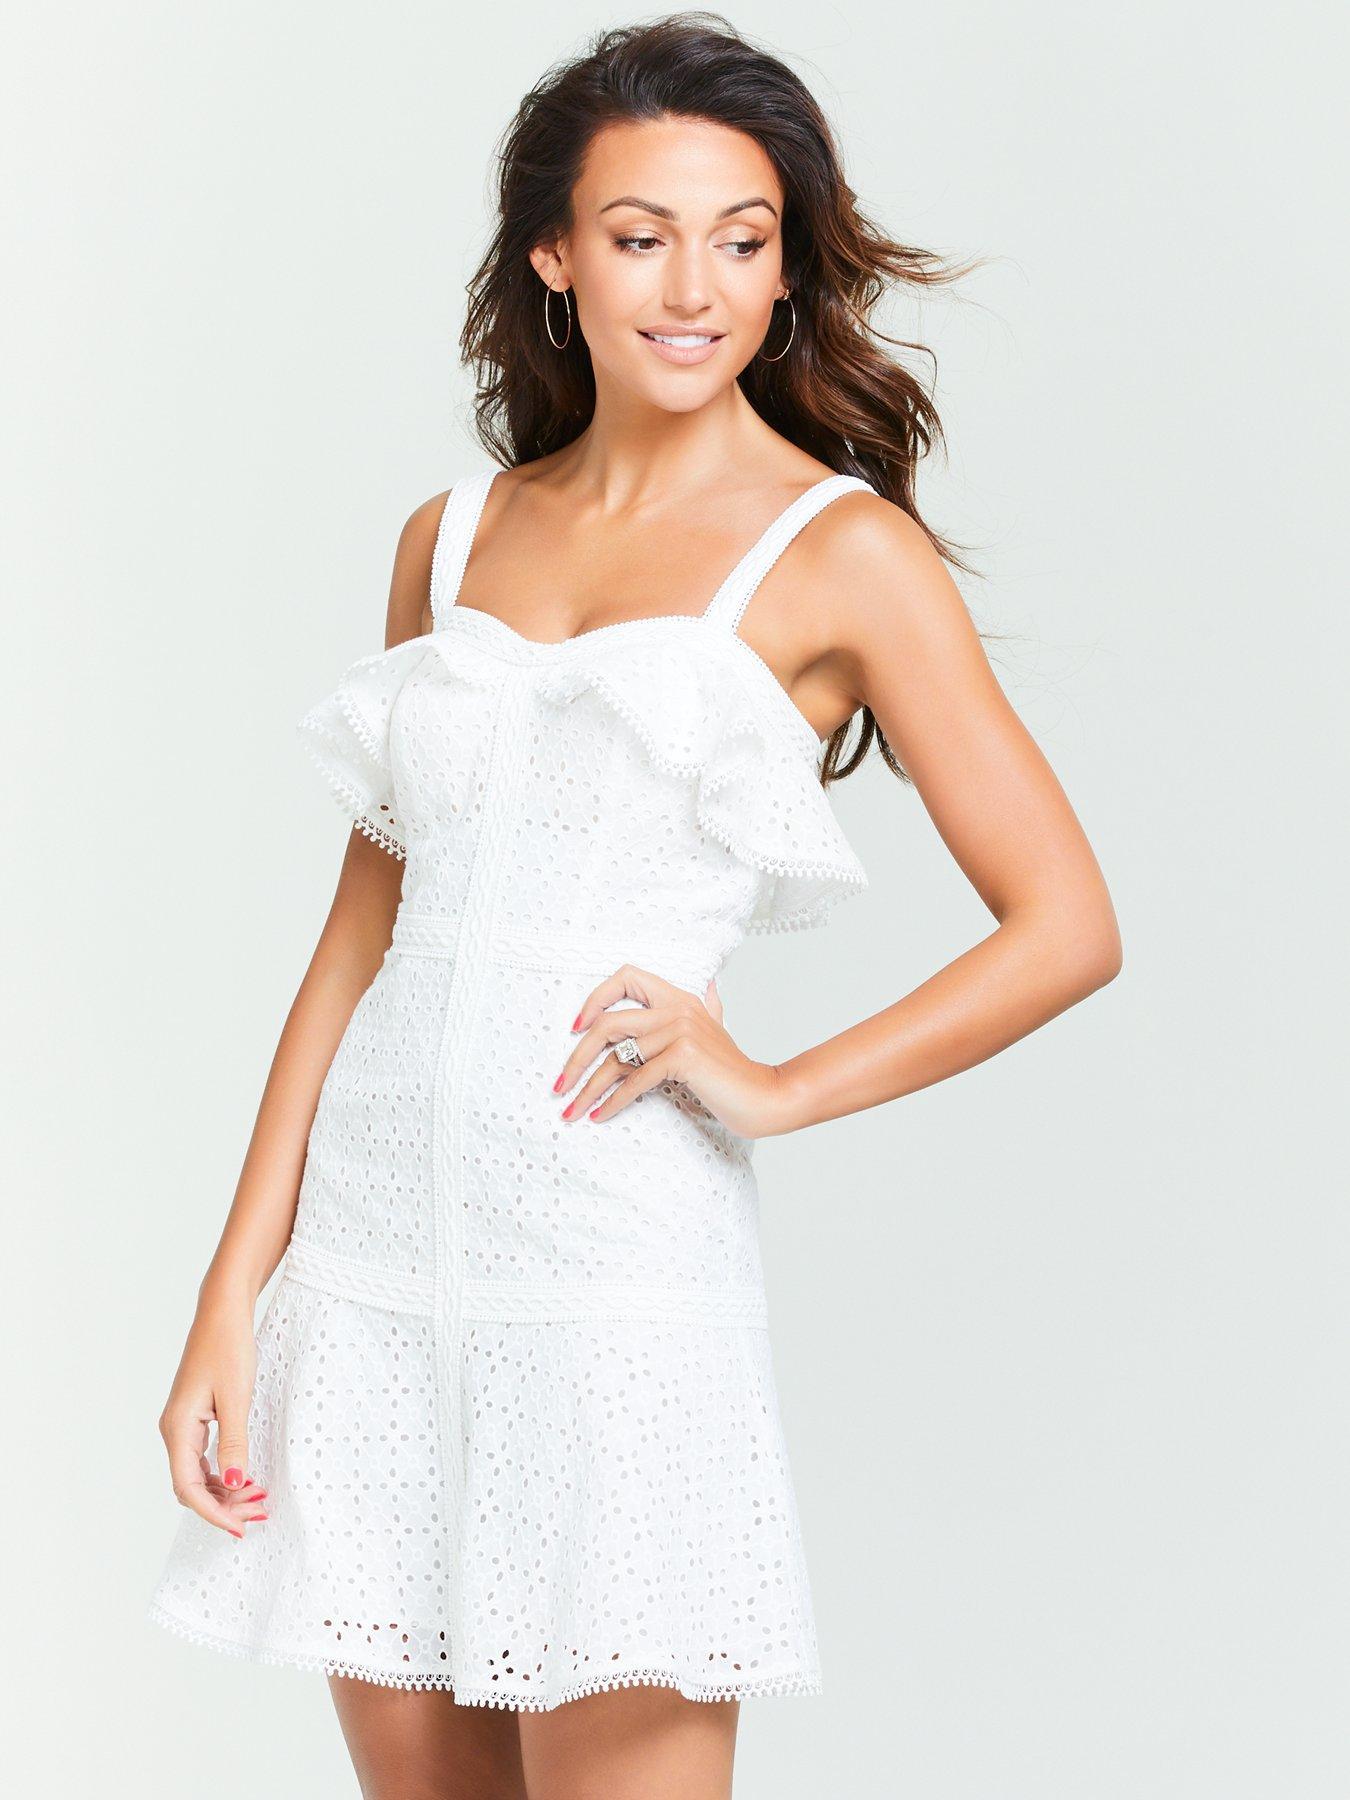 Clothing, Shoes & Accessories Asos Tile Print High Neck Bikini Bnwt Size M More Discounts Surprises